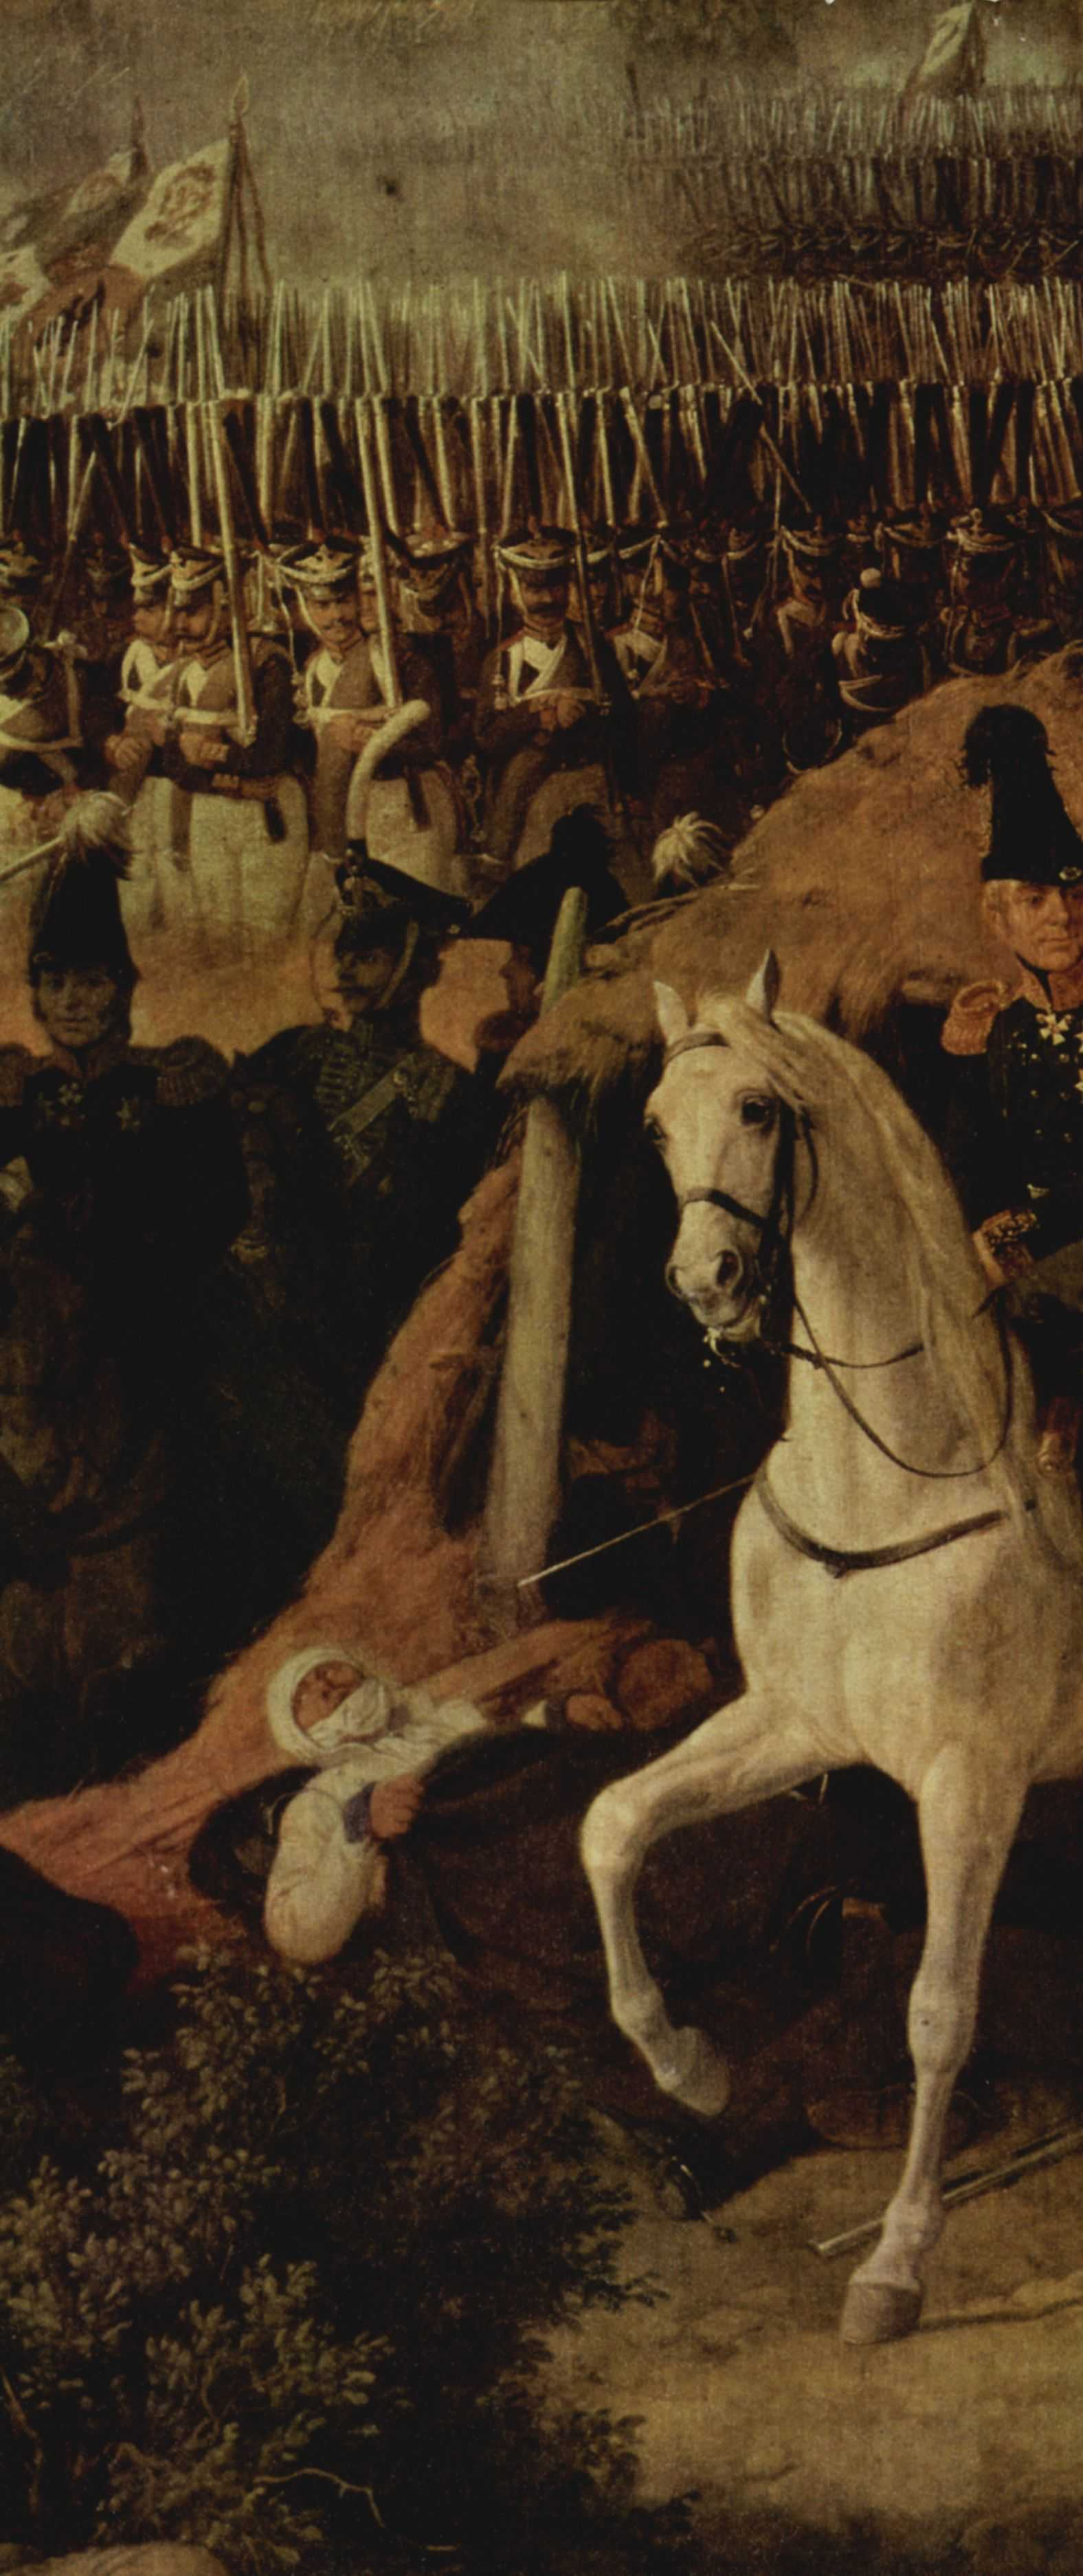 Peter von Hess. The battle of Borodino